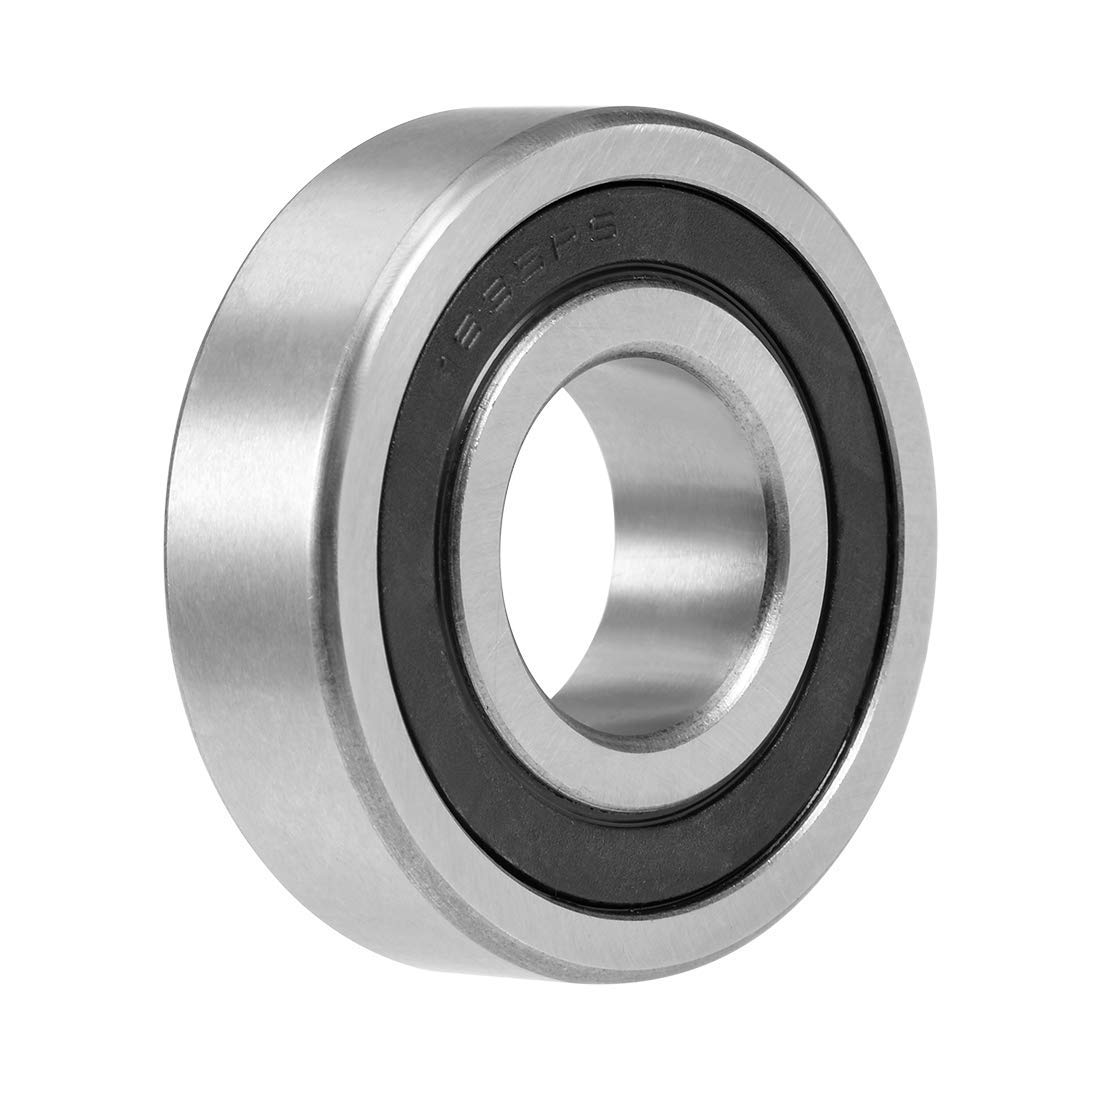 2Double Sealed Chrome Steel Bearings 1 Package 1635-2RS Deep Groove Ball Bearings 3//4x1 3//4 x1